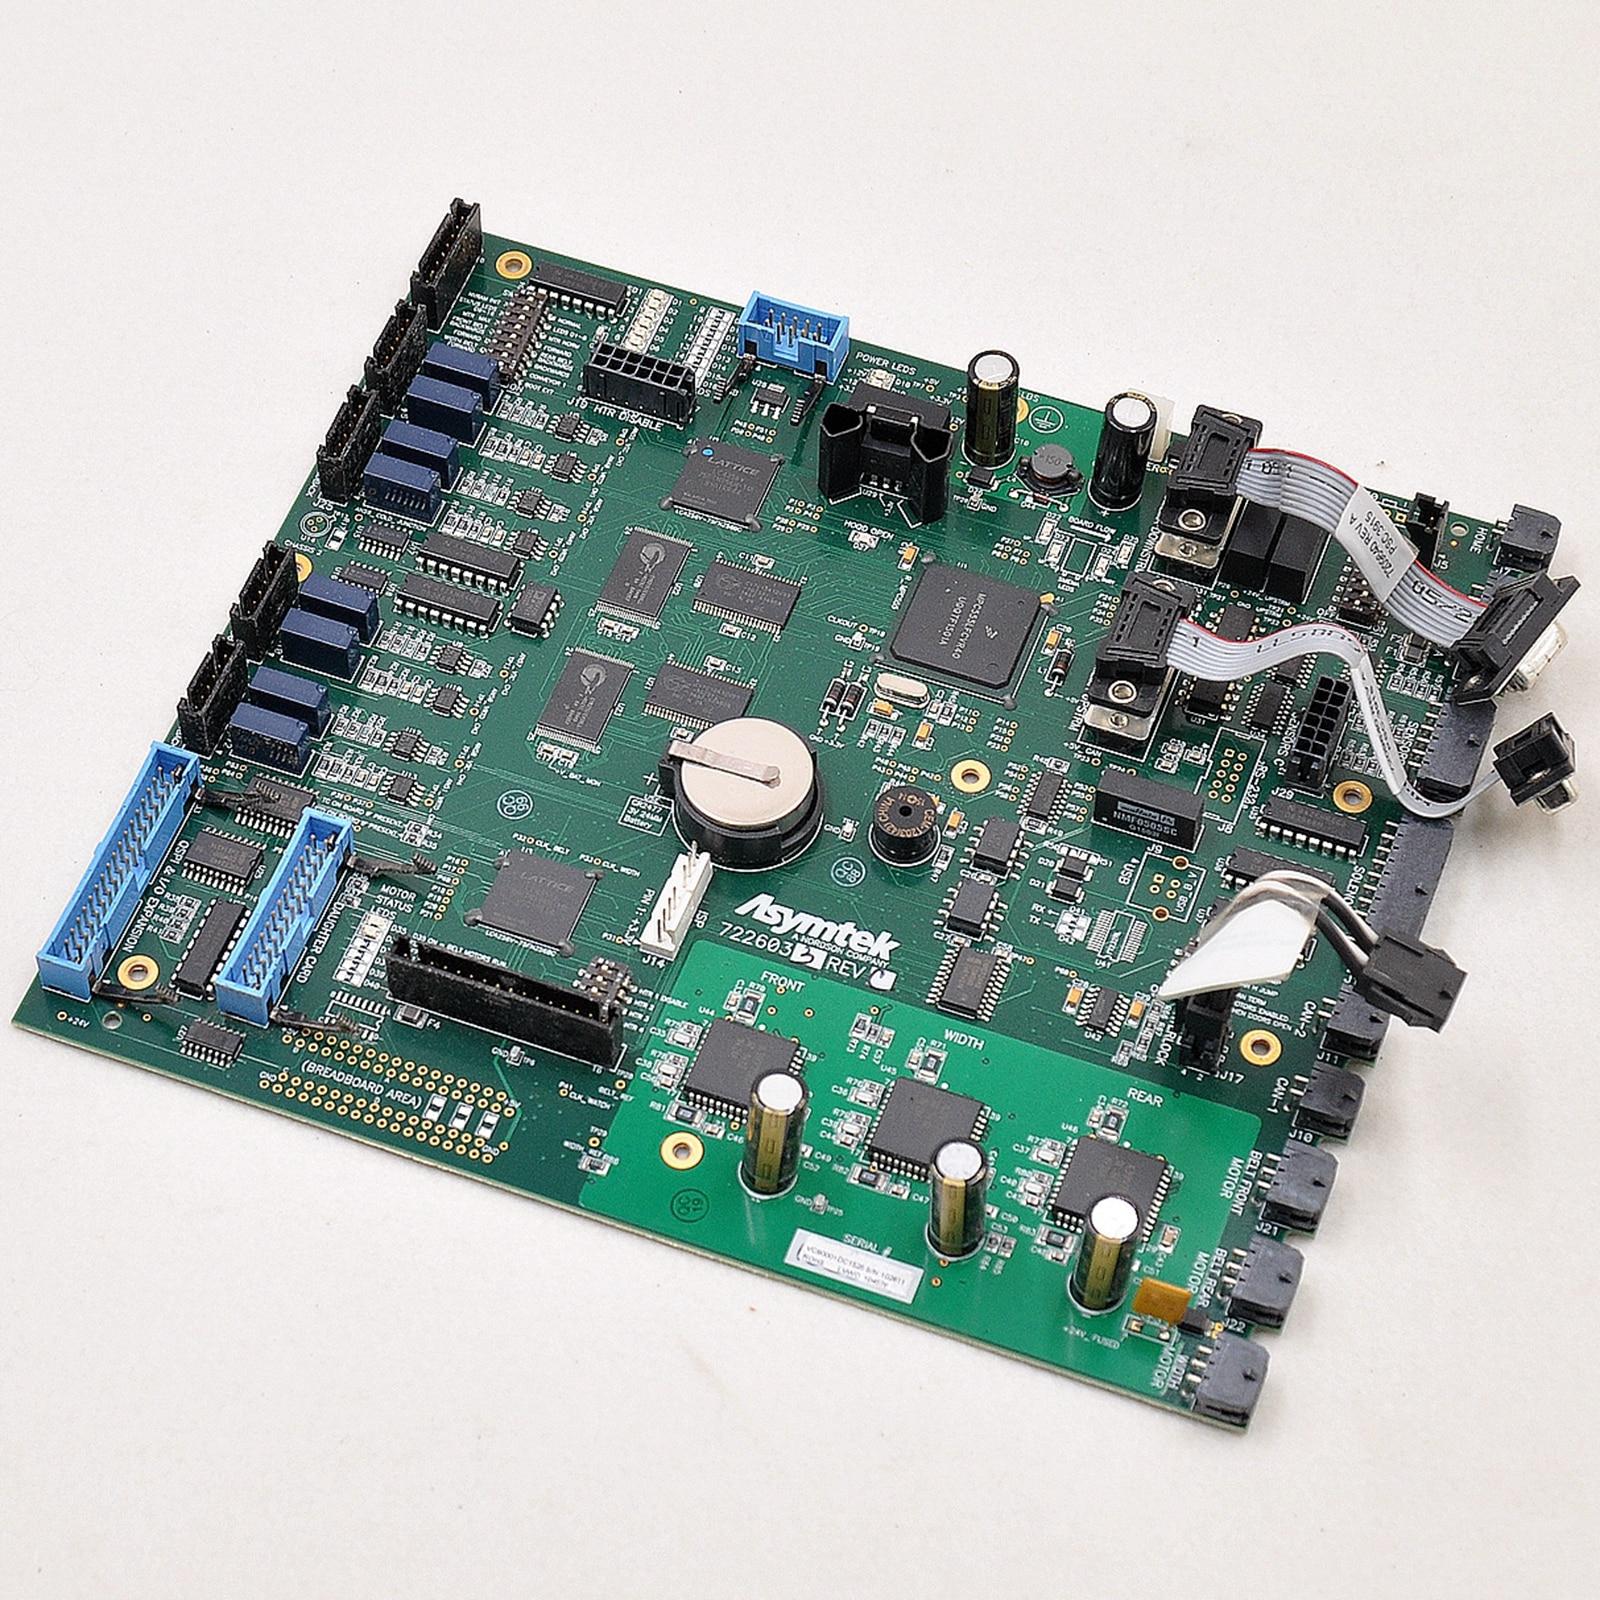 Asymtek 7226033 REVC Dispenser Track Control Board